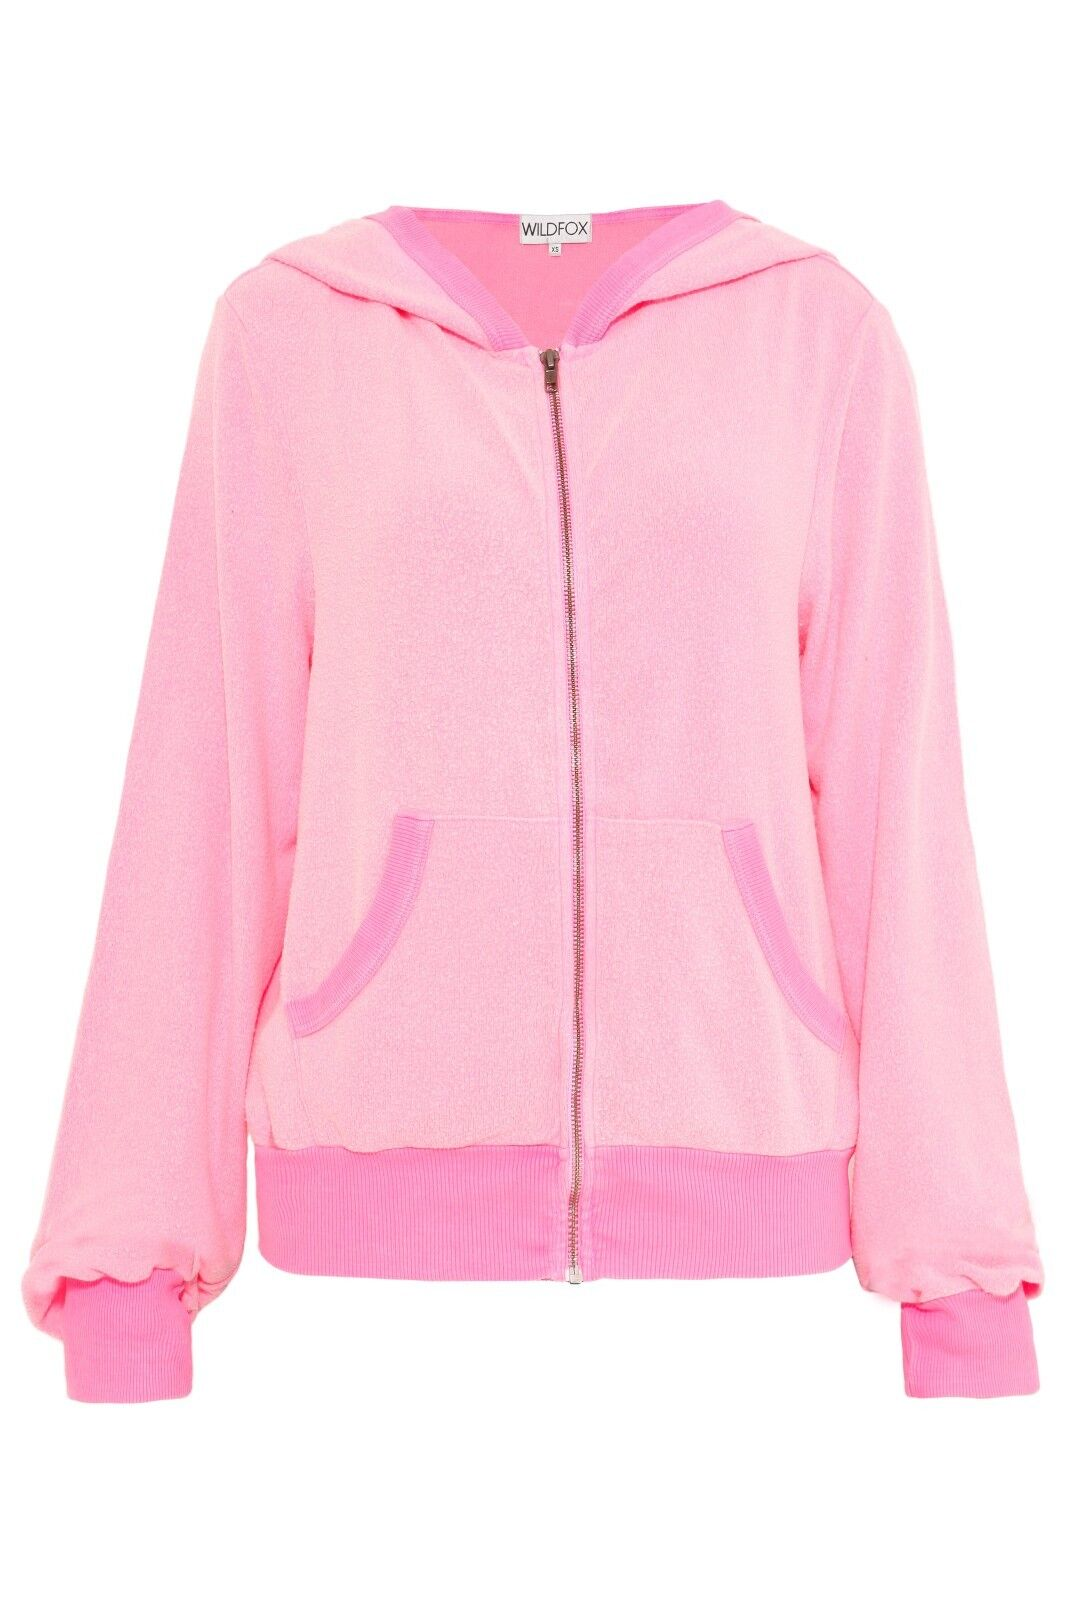 Wildfox sweatshirt, zip, basics, long sleeve, baggy, baggy, baggy, hoodie, pink, new, s. s 6bc3d2